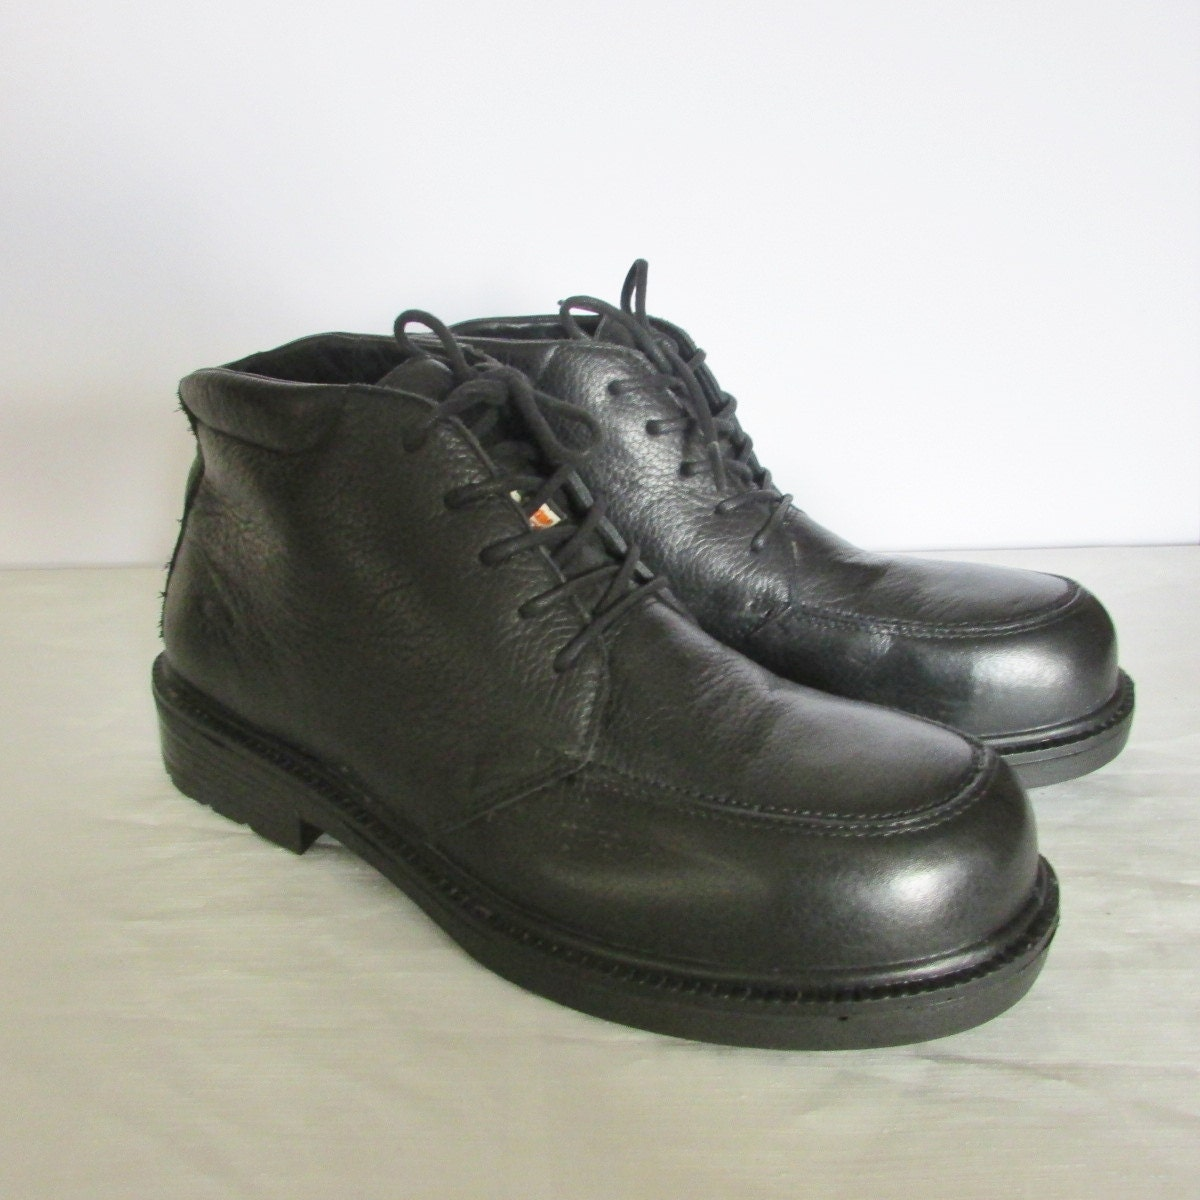 dakota mens size 10 5 wide black leather work boots safety